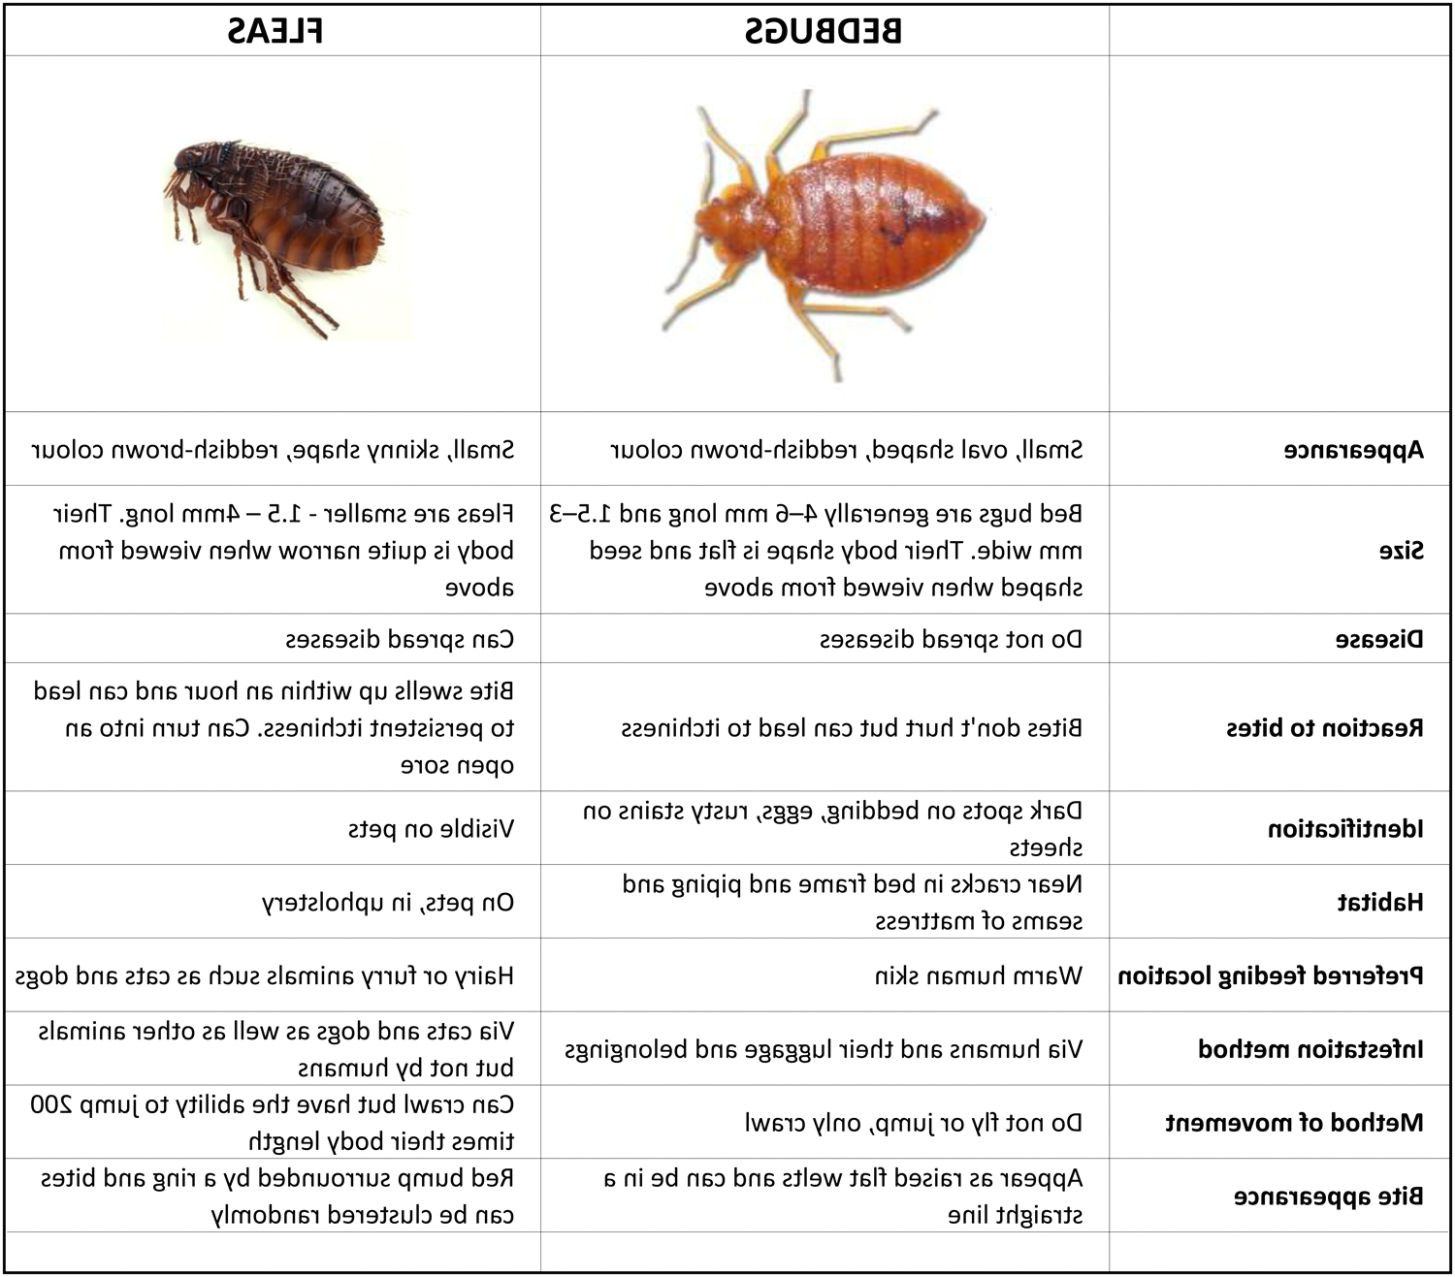 photo 3 of 10 bed bugs vs fleas table fleas in mattress 3